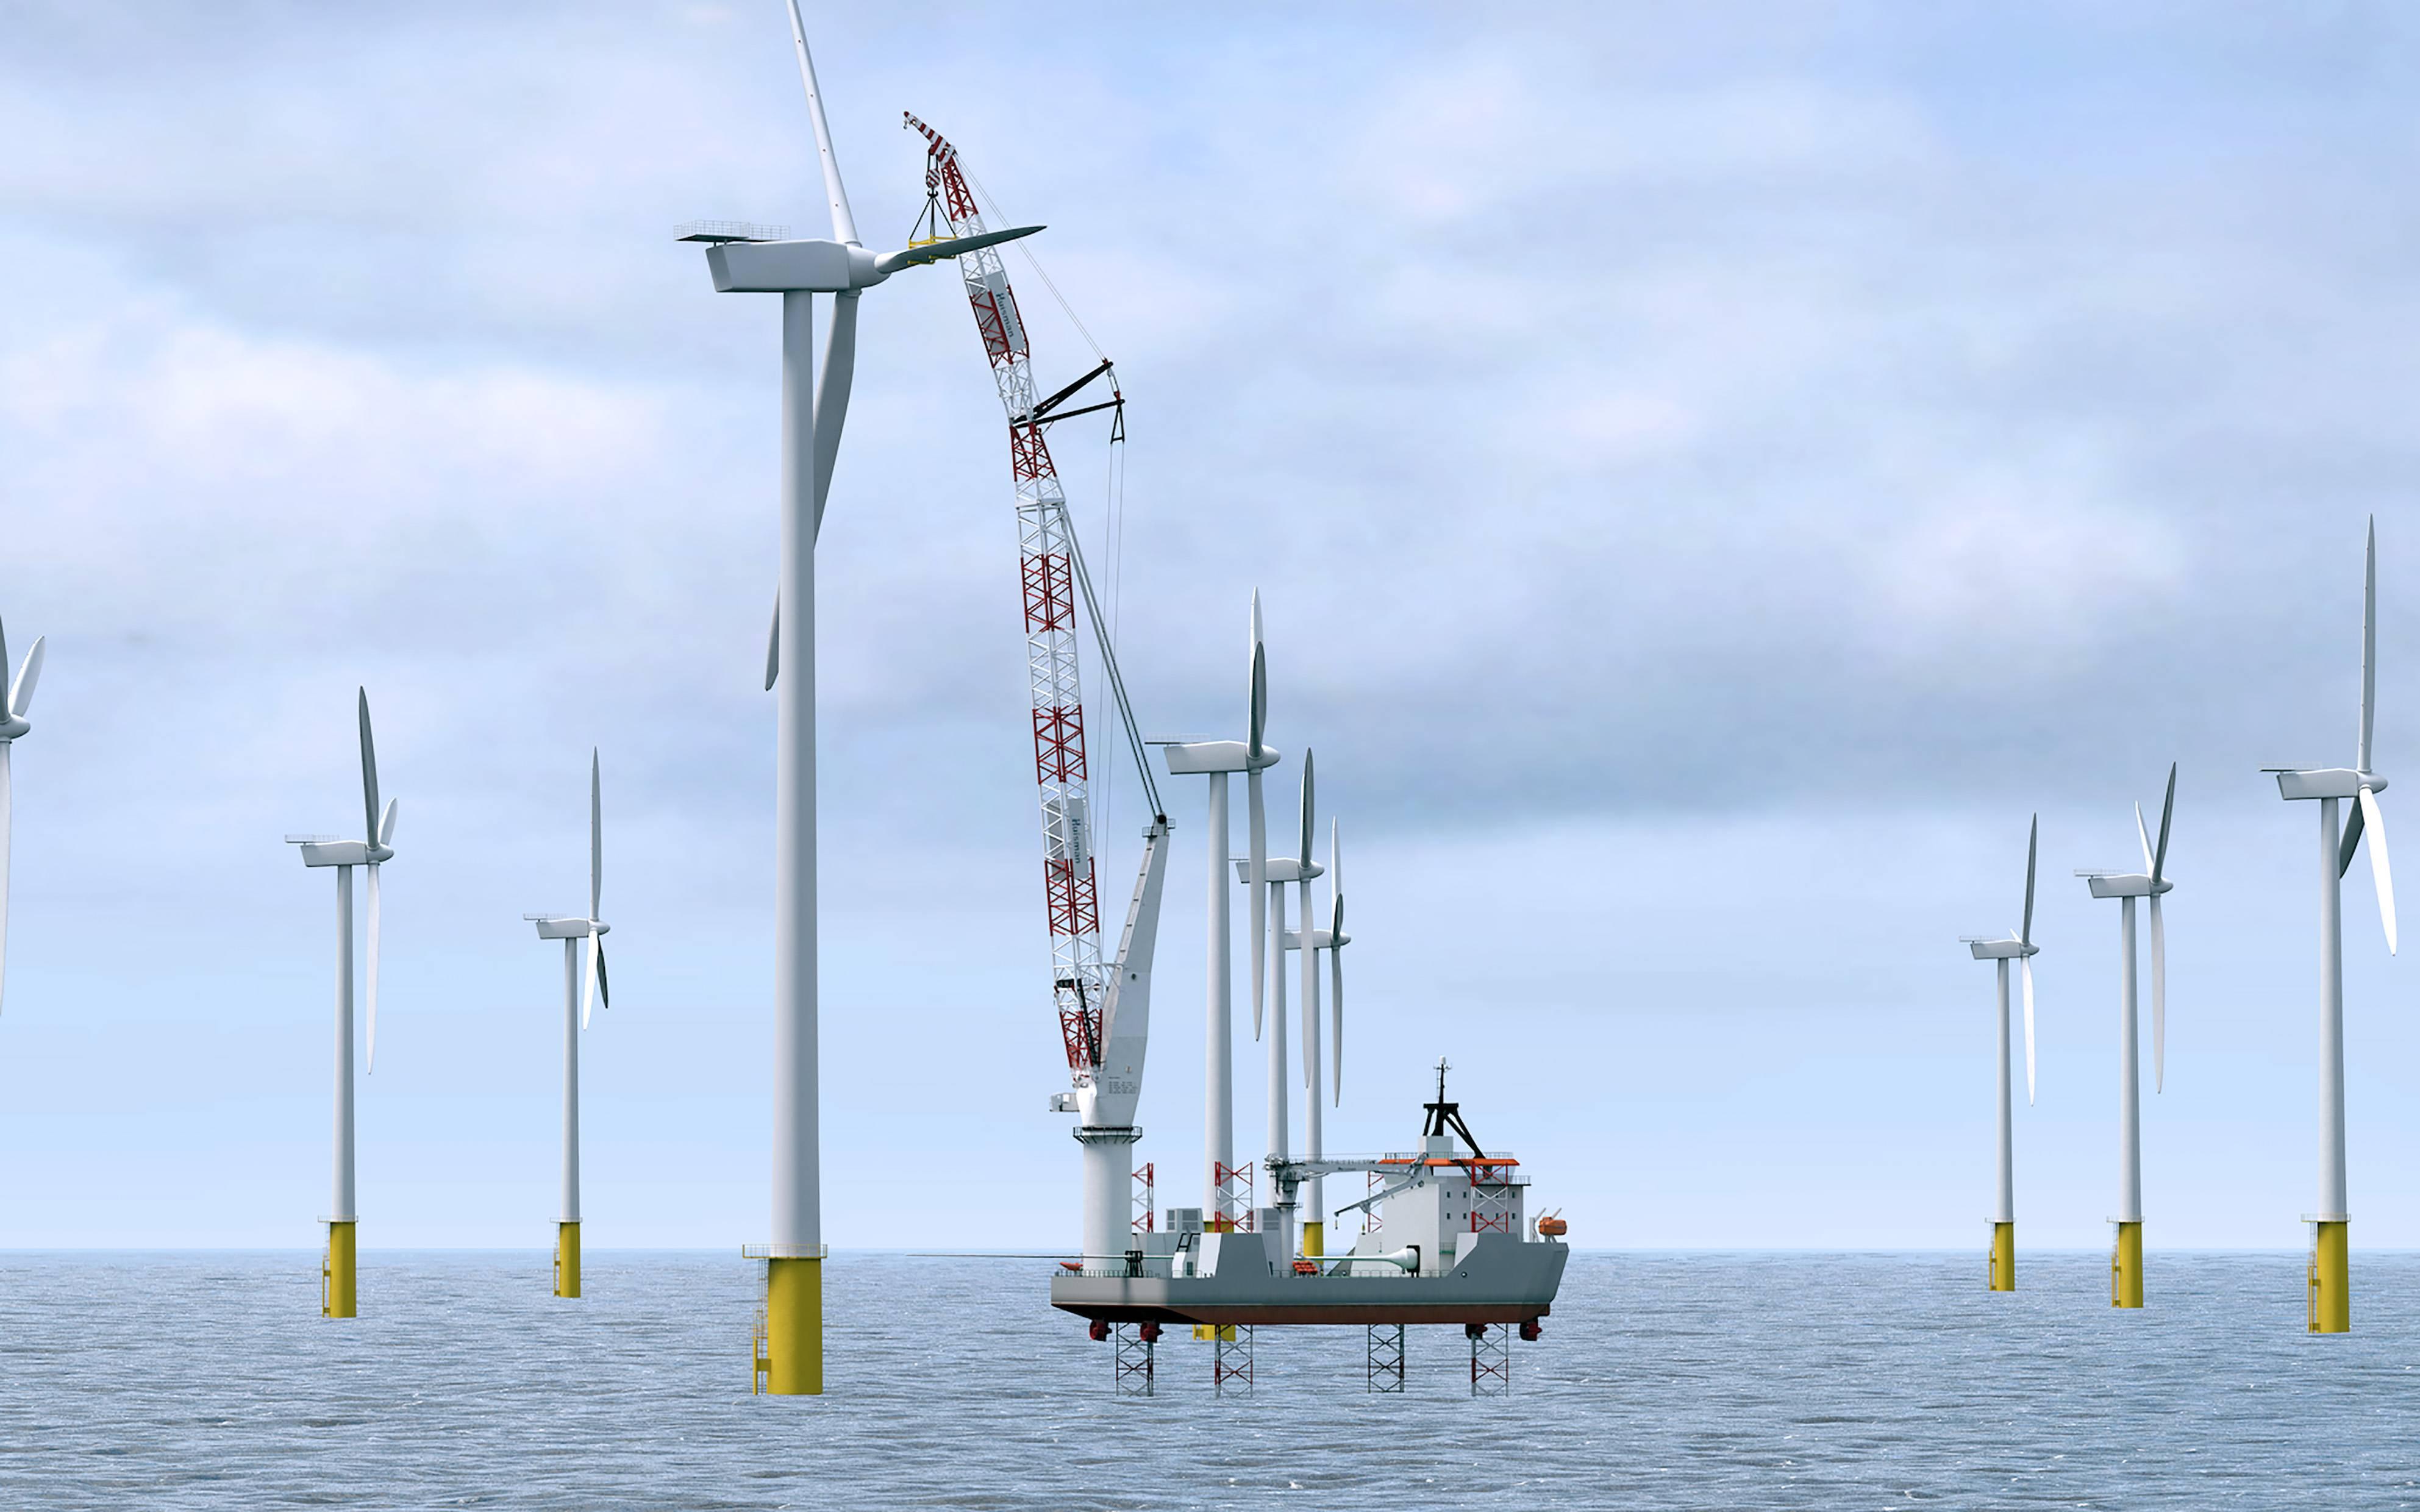 New Crane For Offshore Wind Turbine Repair